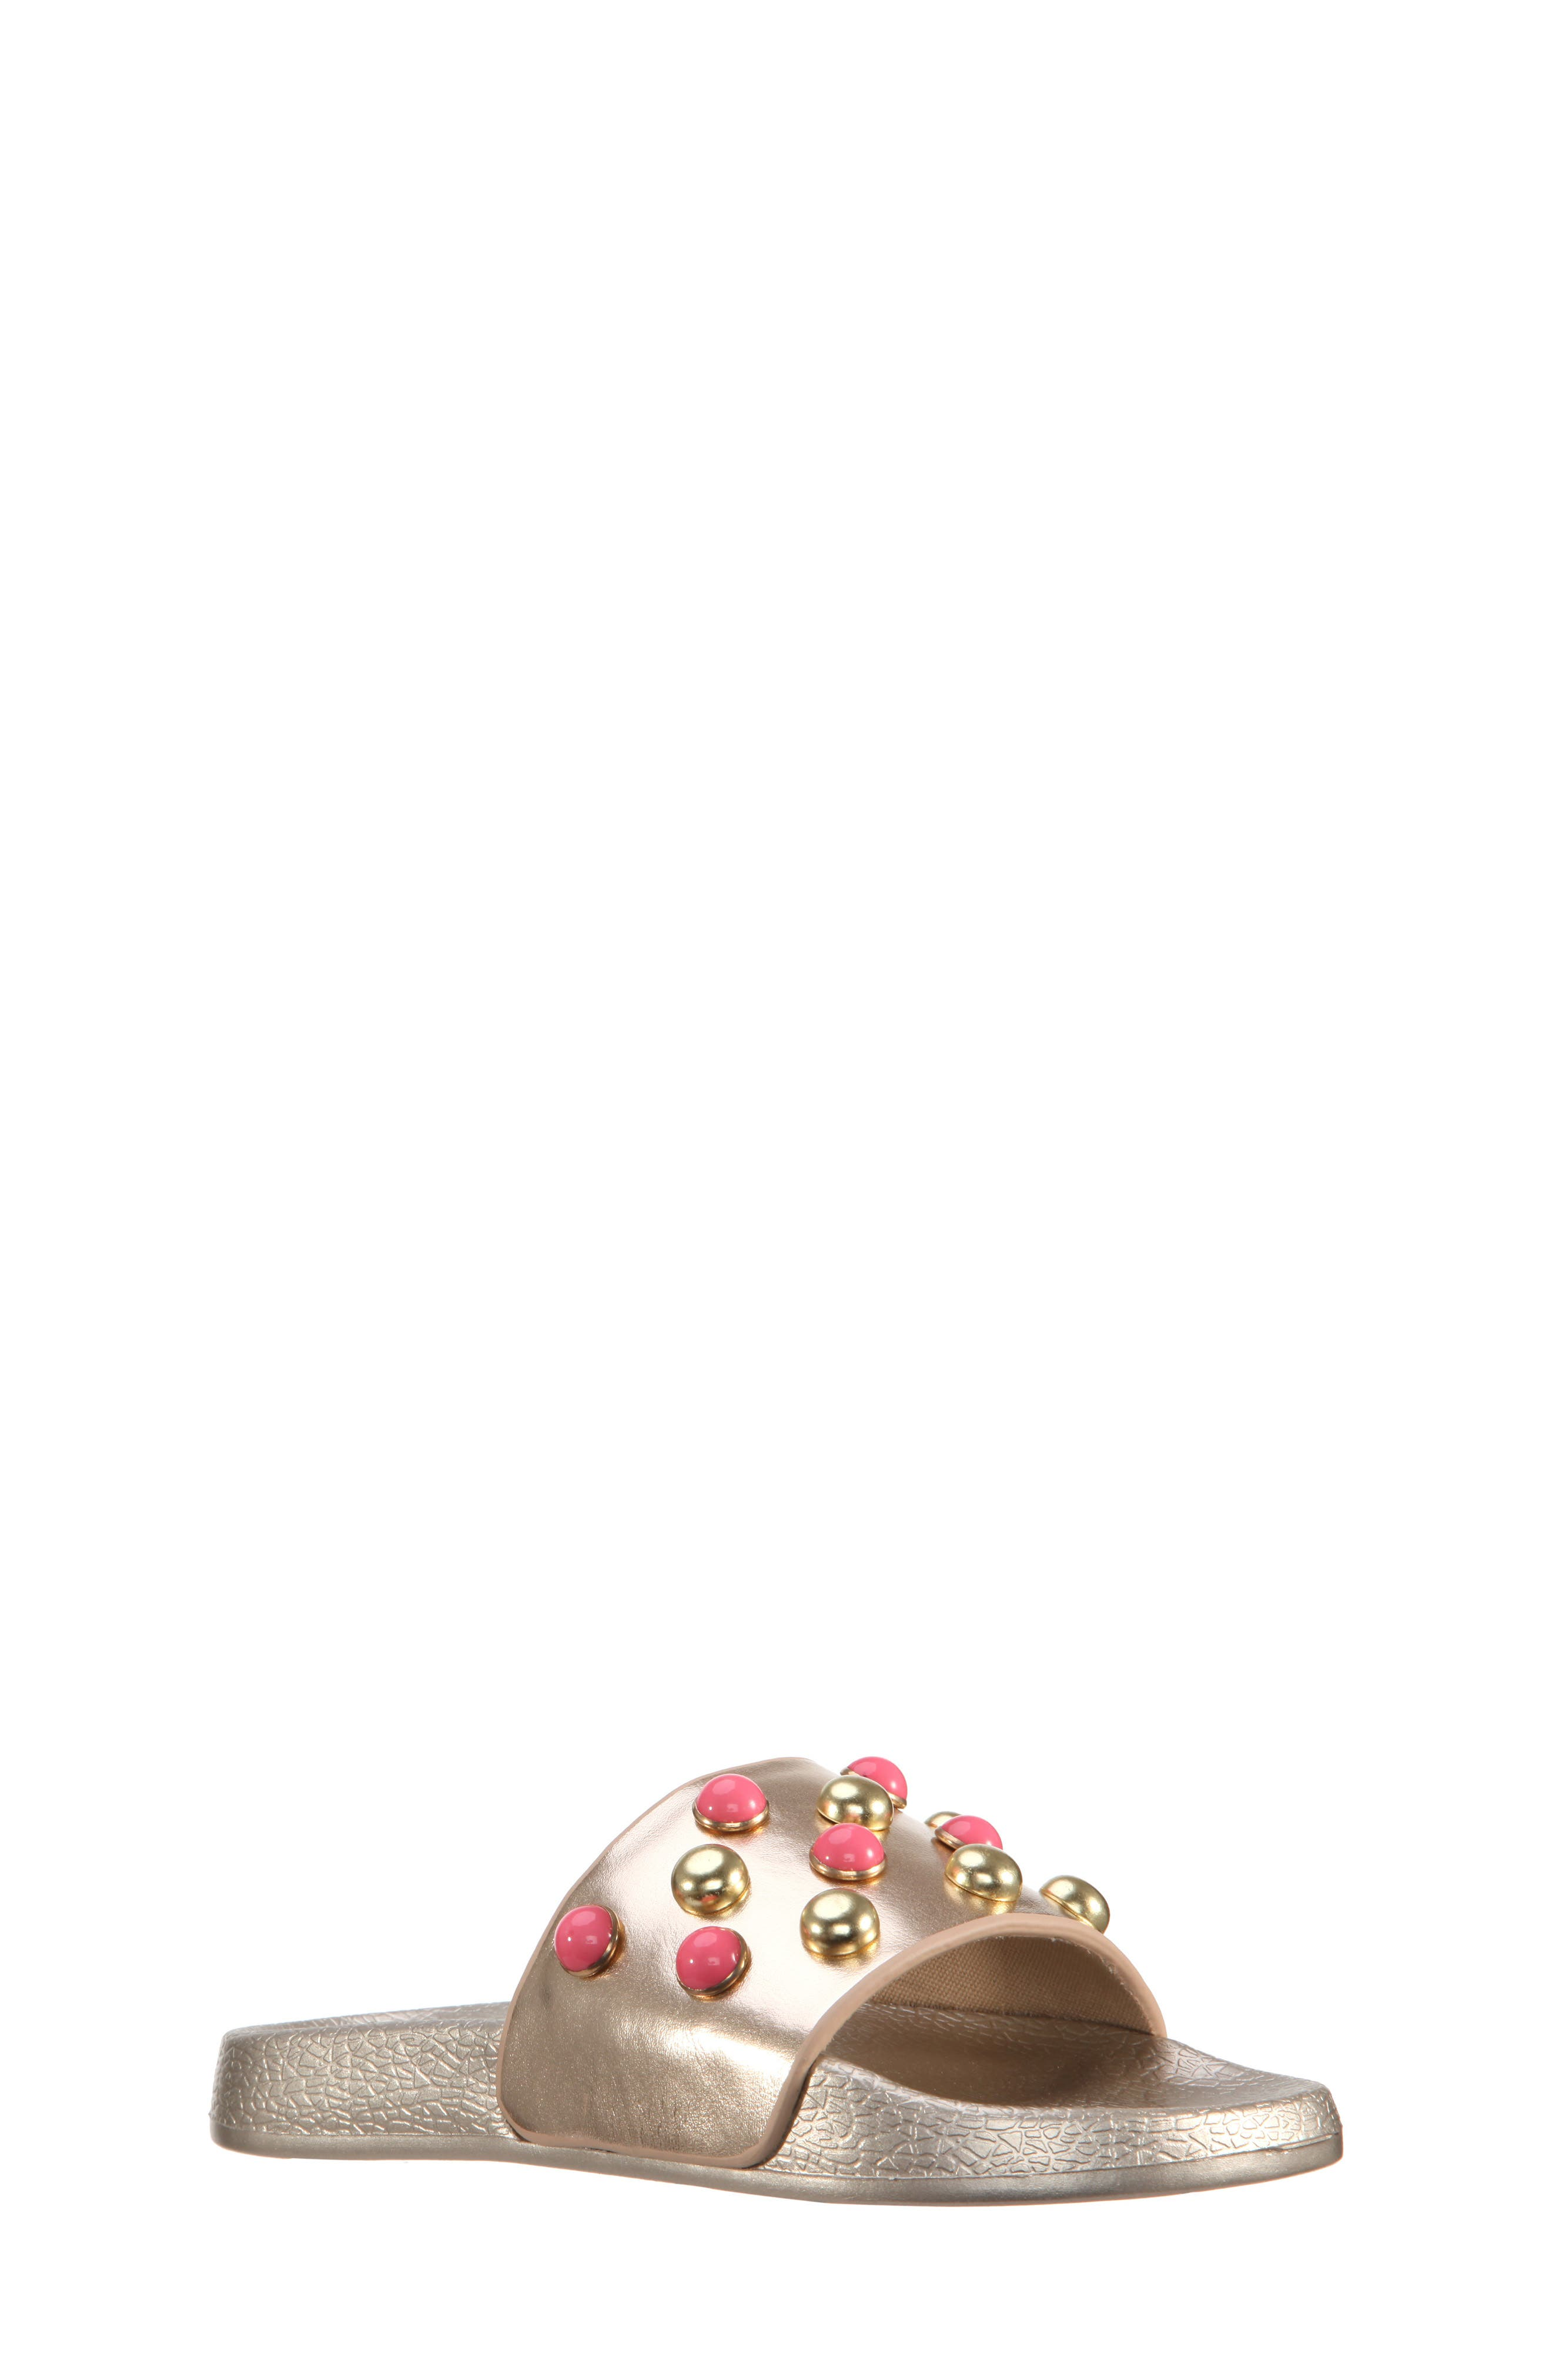 Jeaninne II Metallic Sport Slide Sandal,                         Main,                         color, Platino Metallic